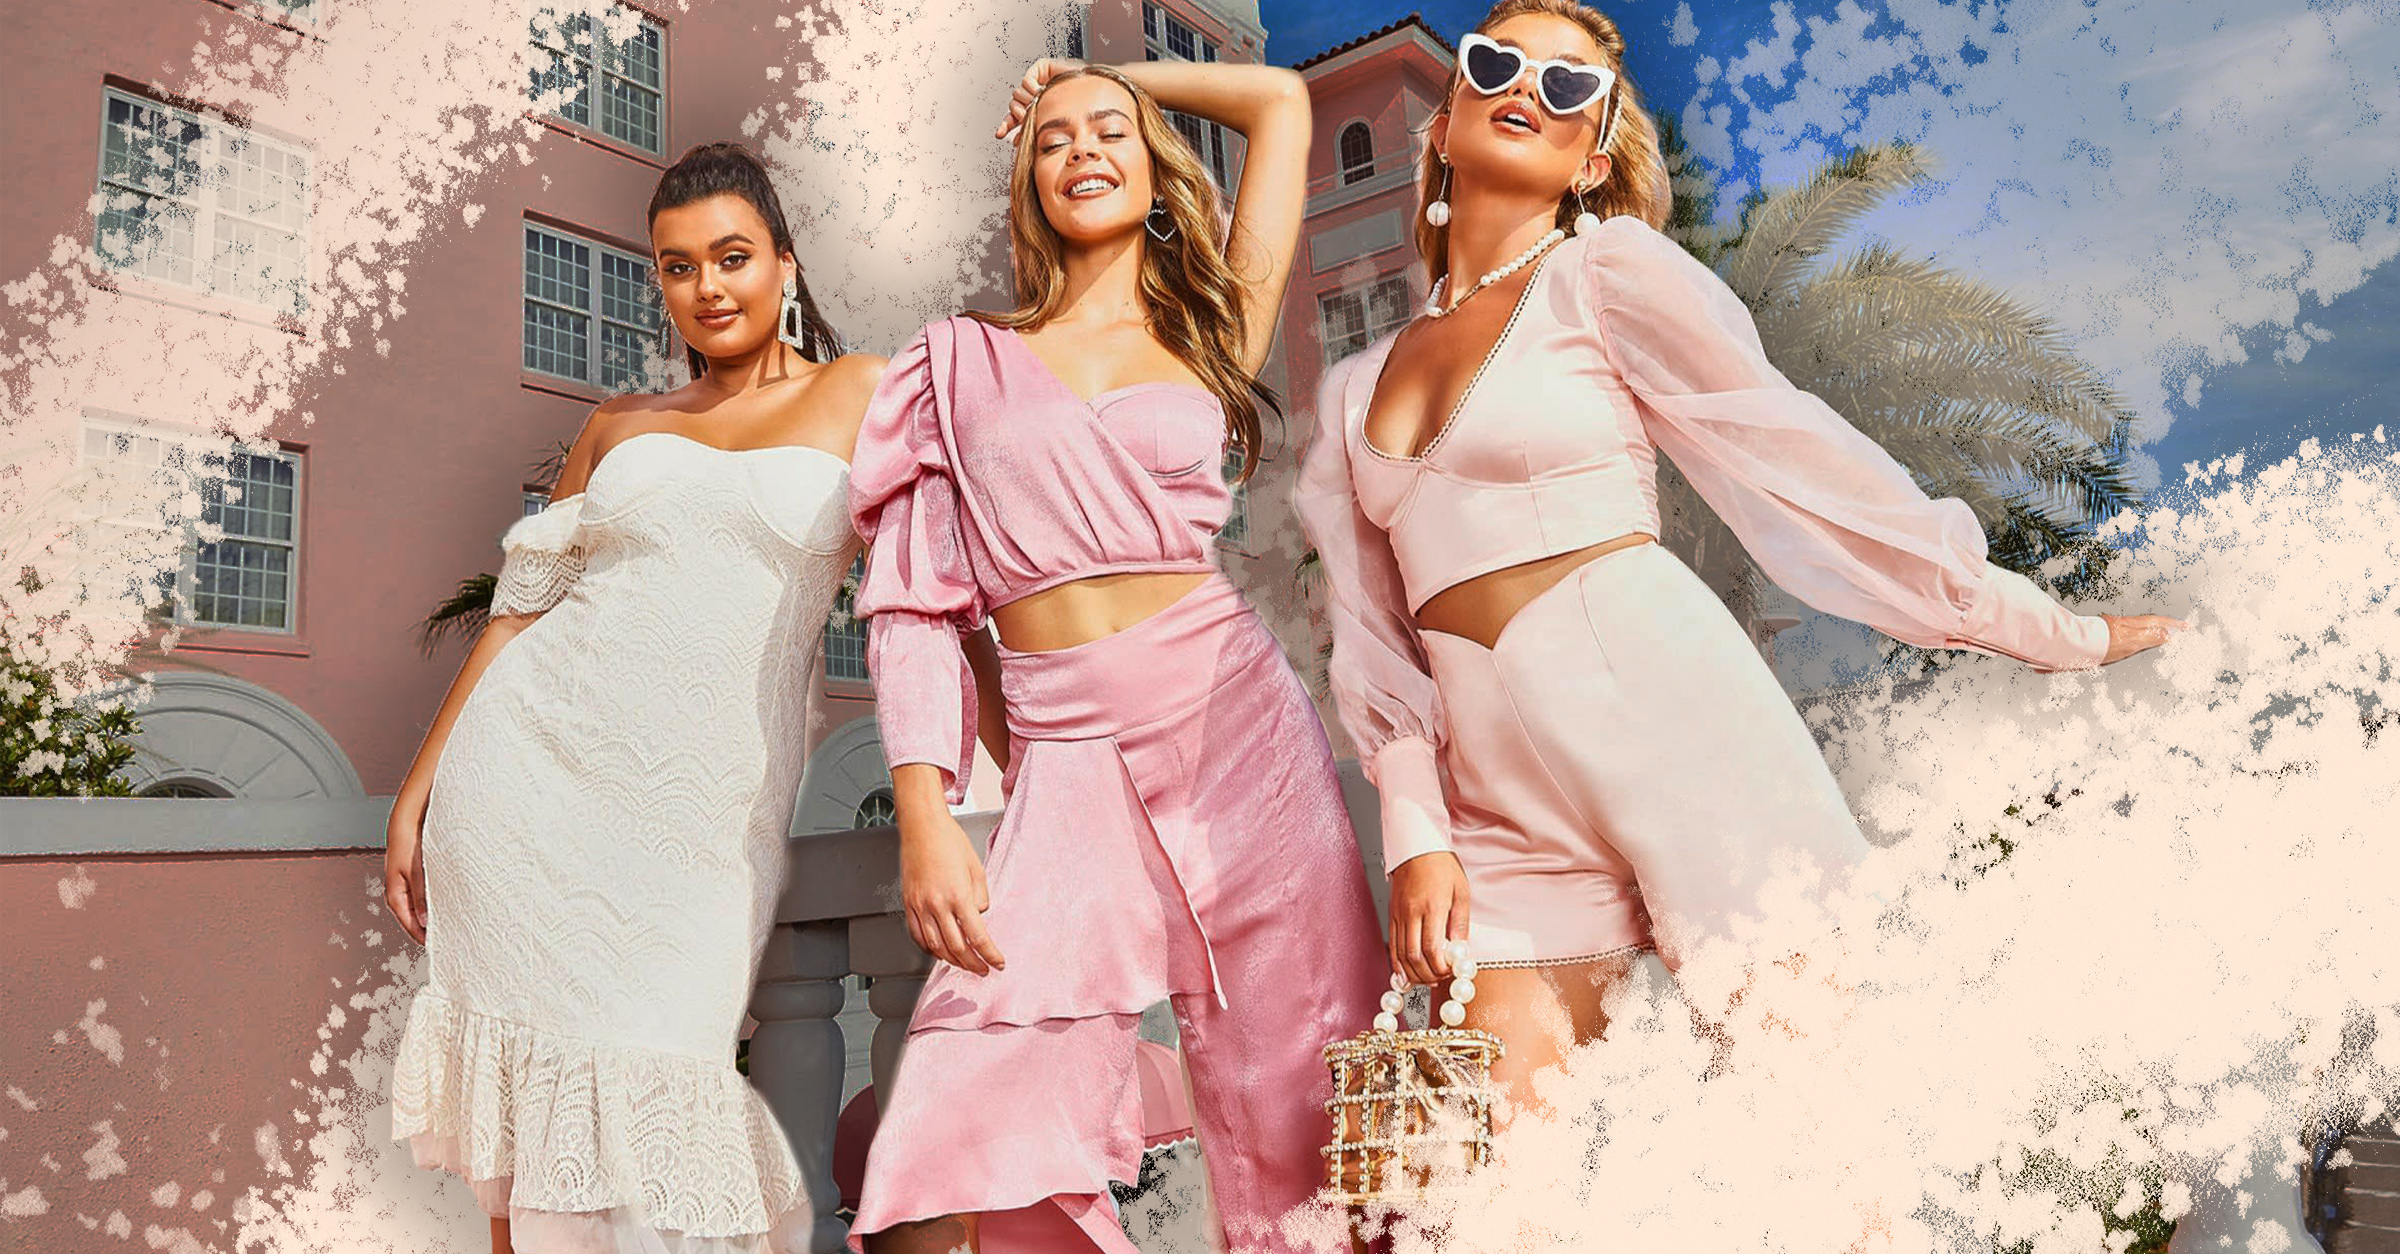 Boohoo Clothing: the Big Player of Digital Fast Fashion Era